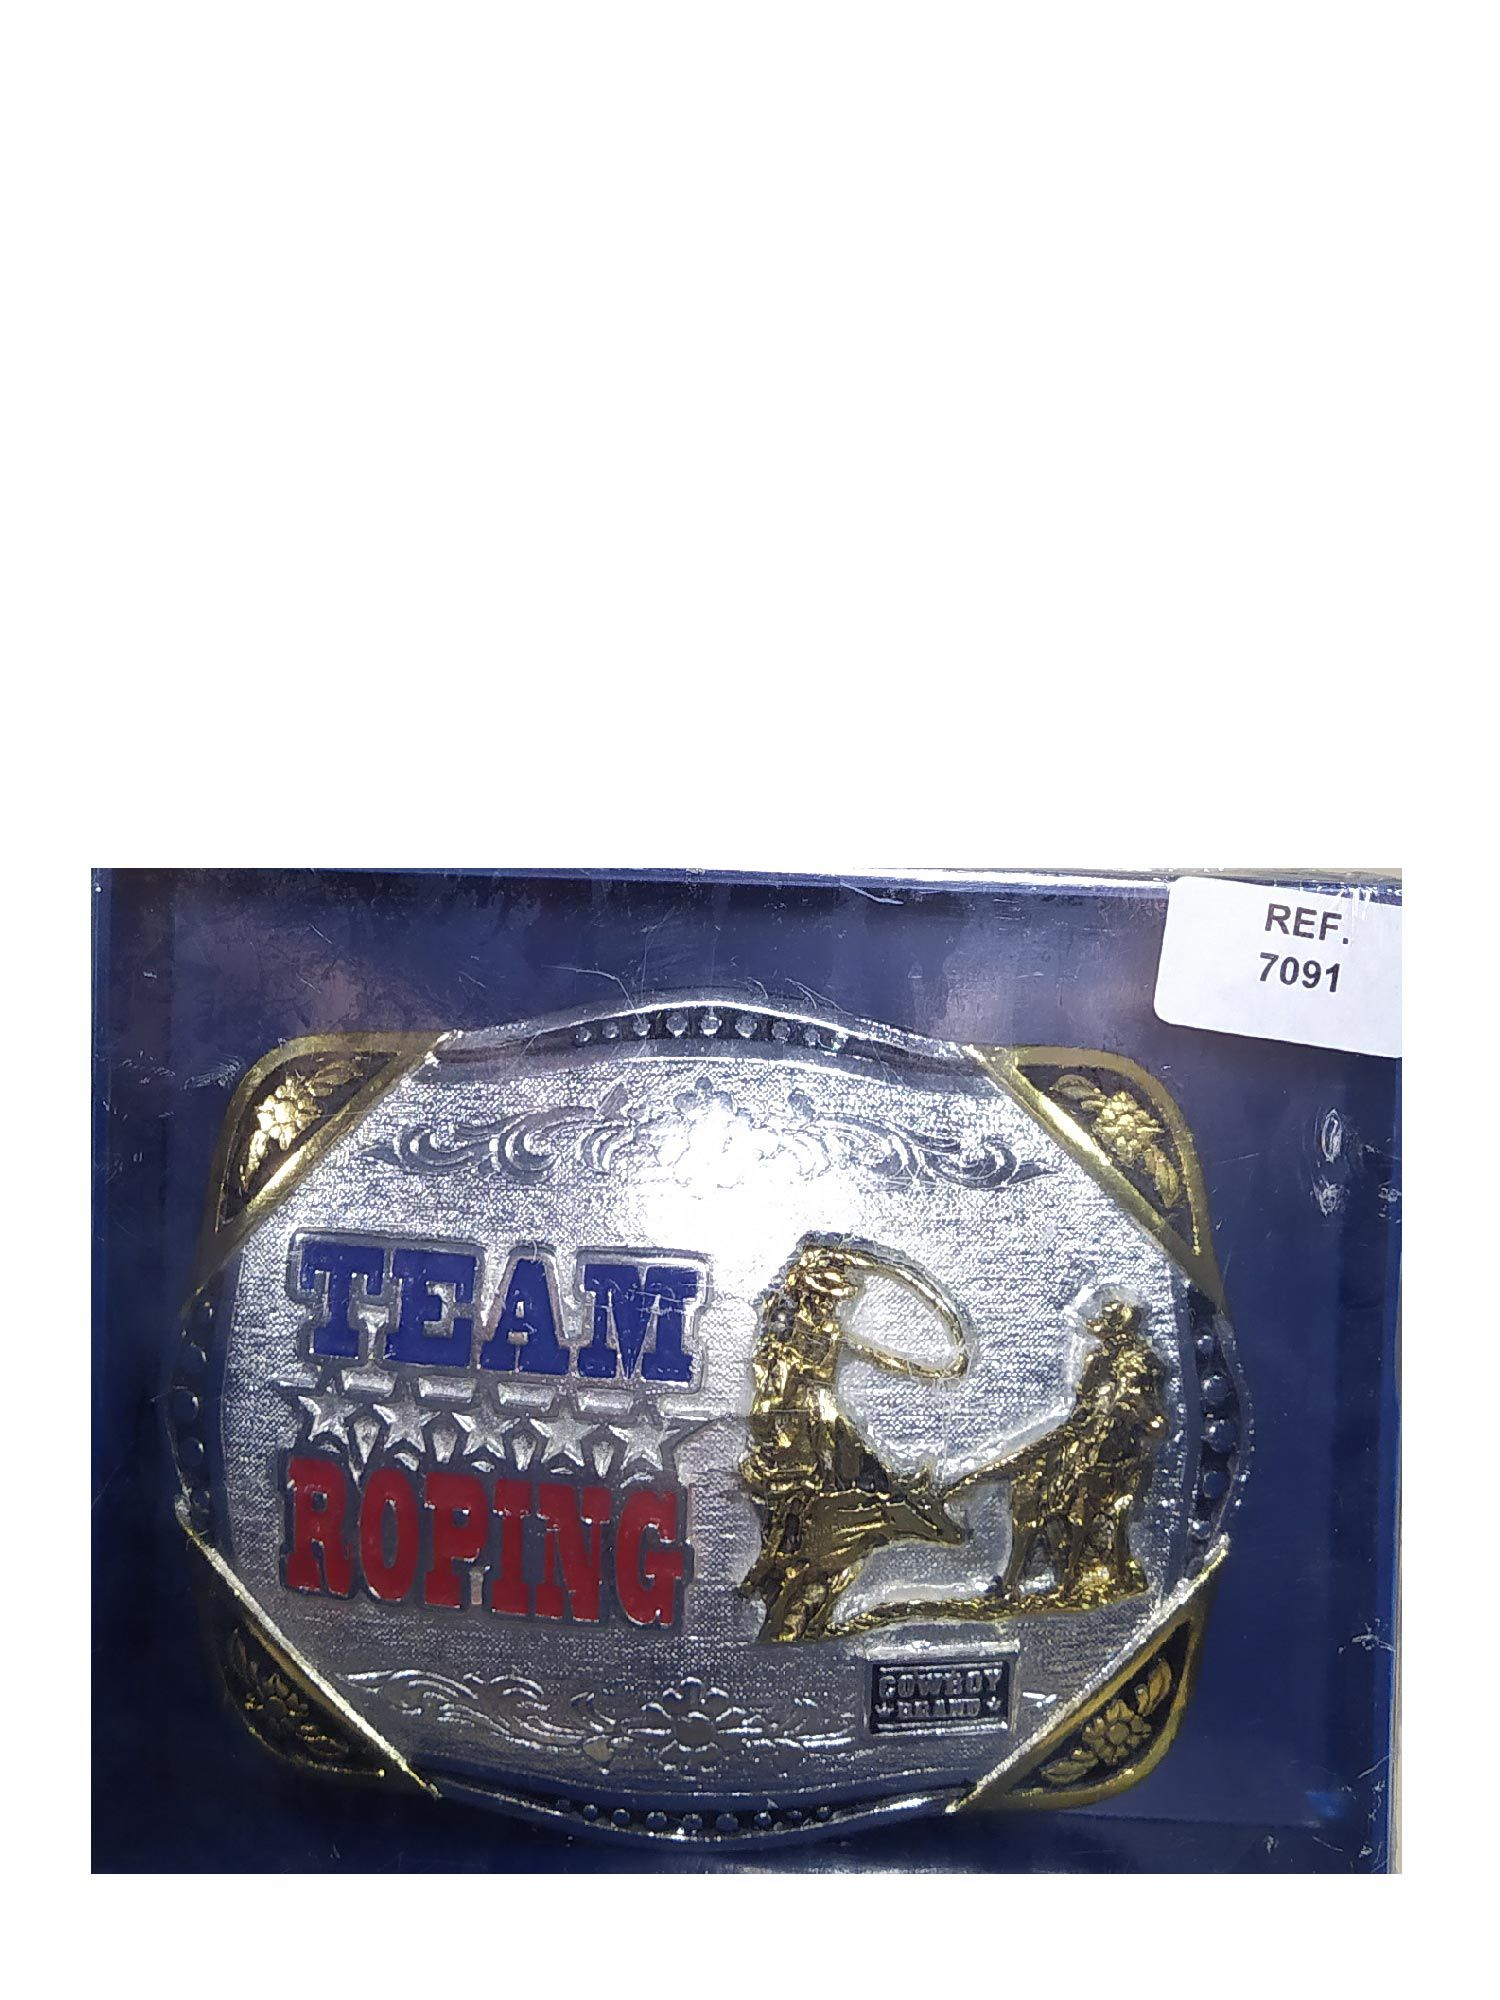 Fivela Cowboy Brand Team Roping Ref. 7091